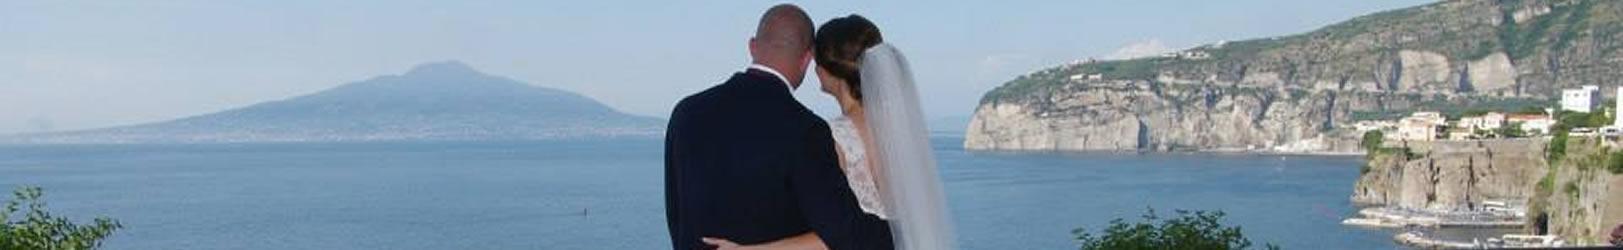 Weddings in Sorrento